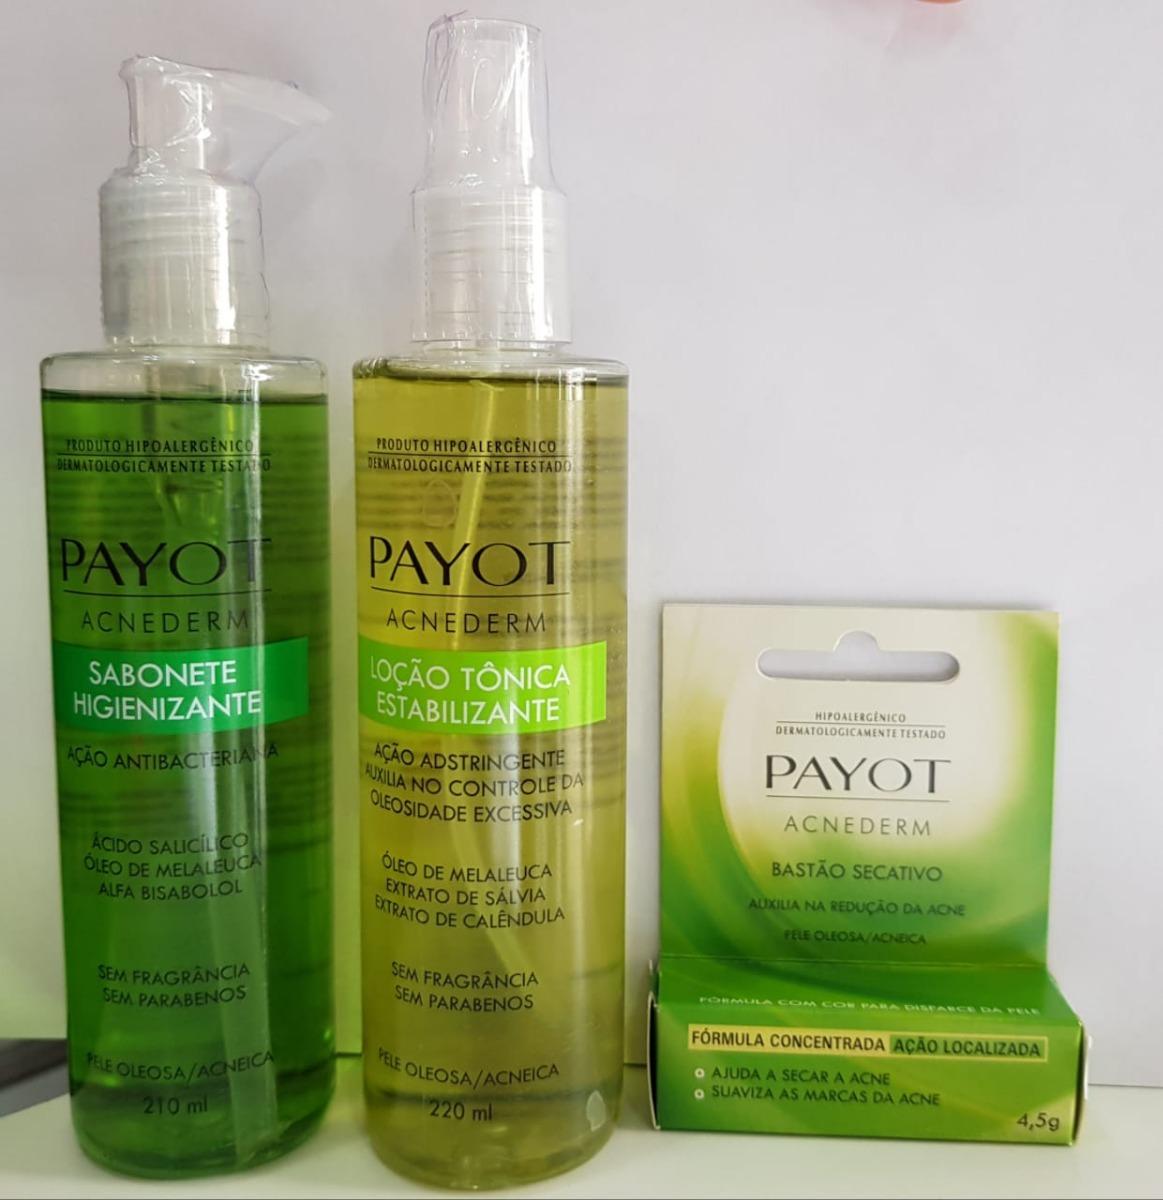 2422b185fc4 Payot Kit Pele Oleosa acneica C  Bastão